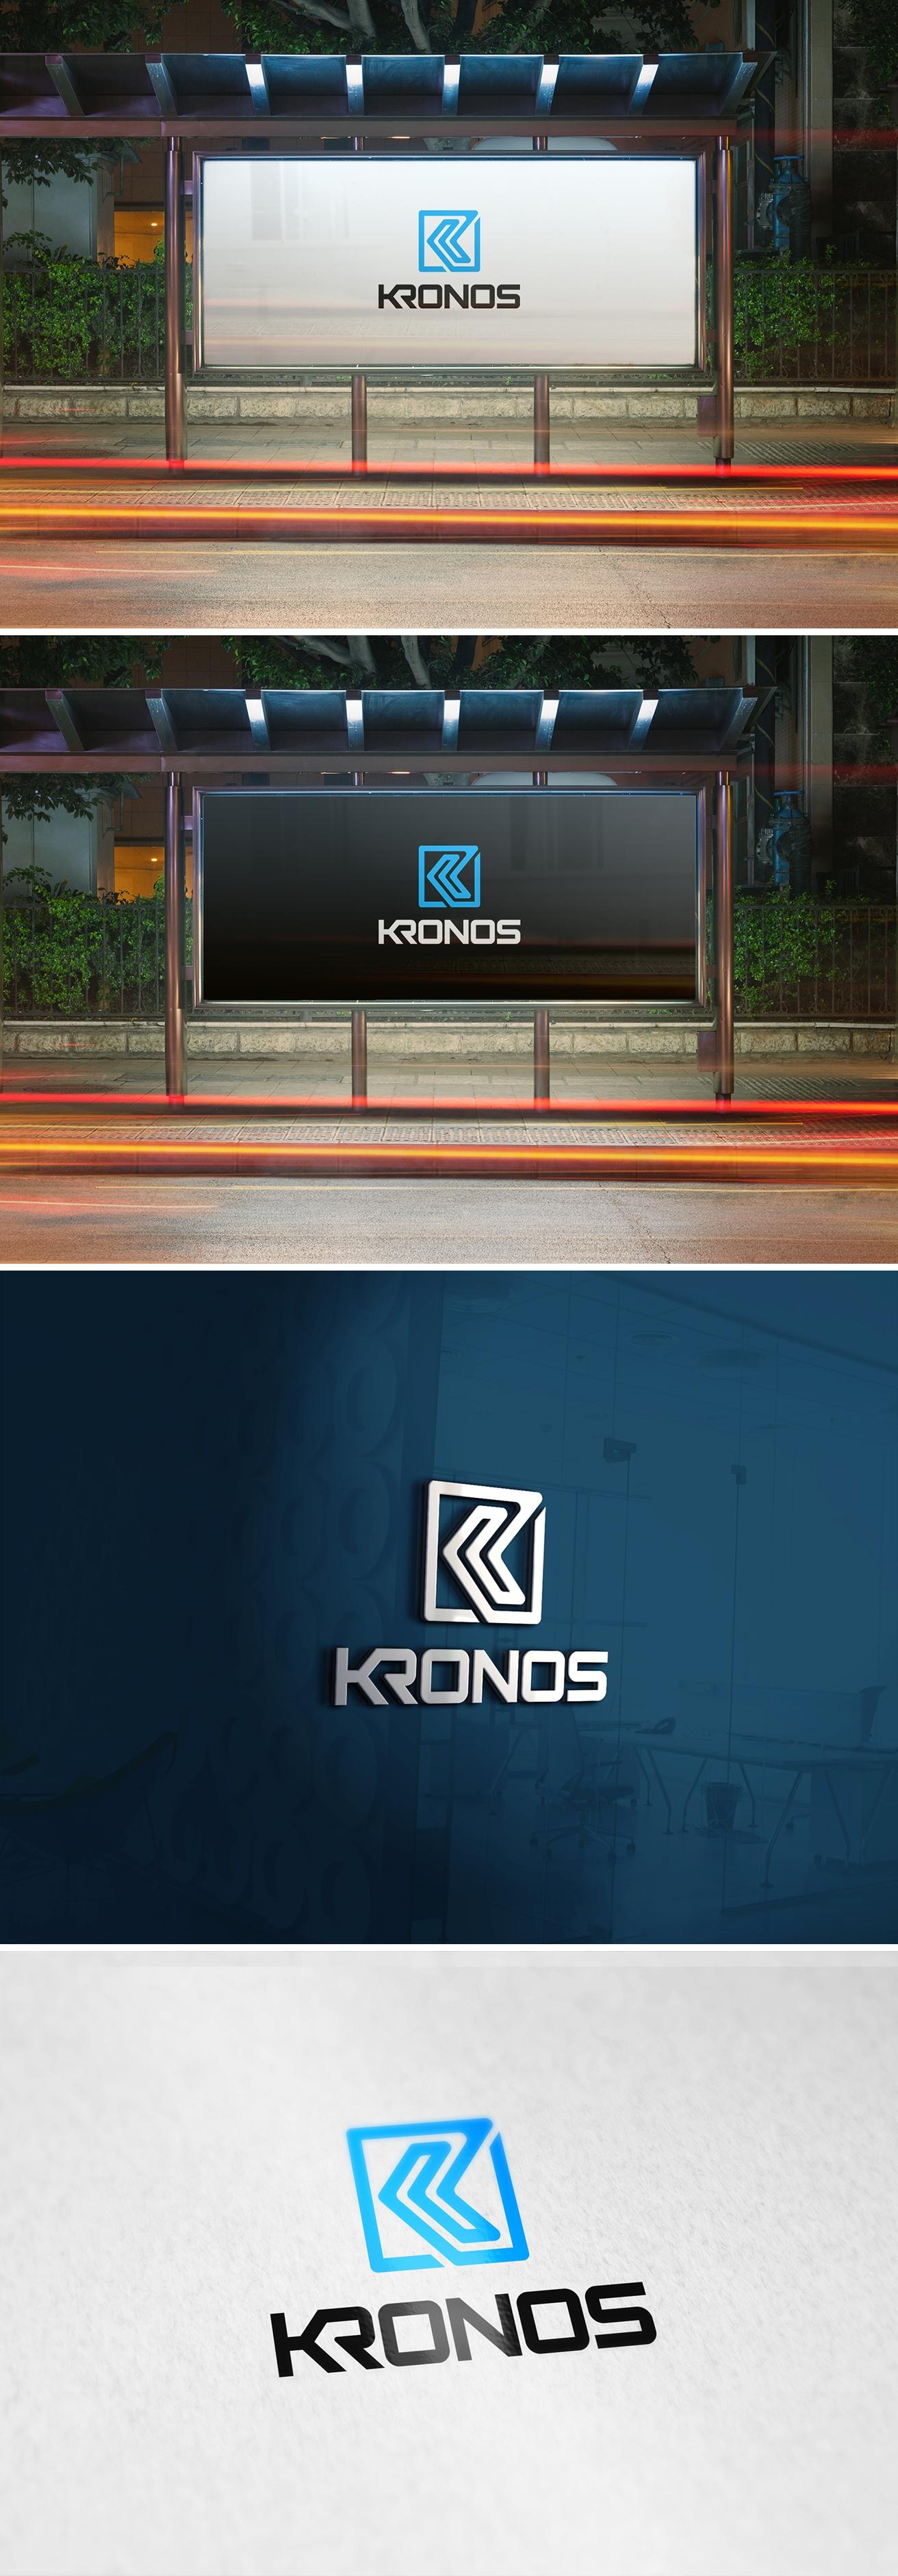 Разработать логотип KRONOS фото f_8675faf9ded66518.jpg